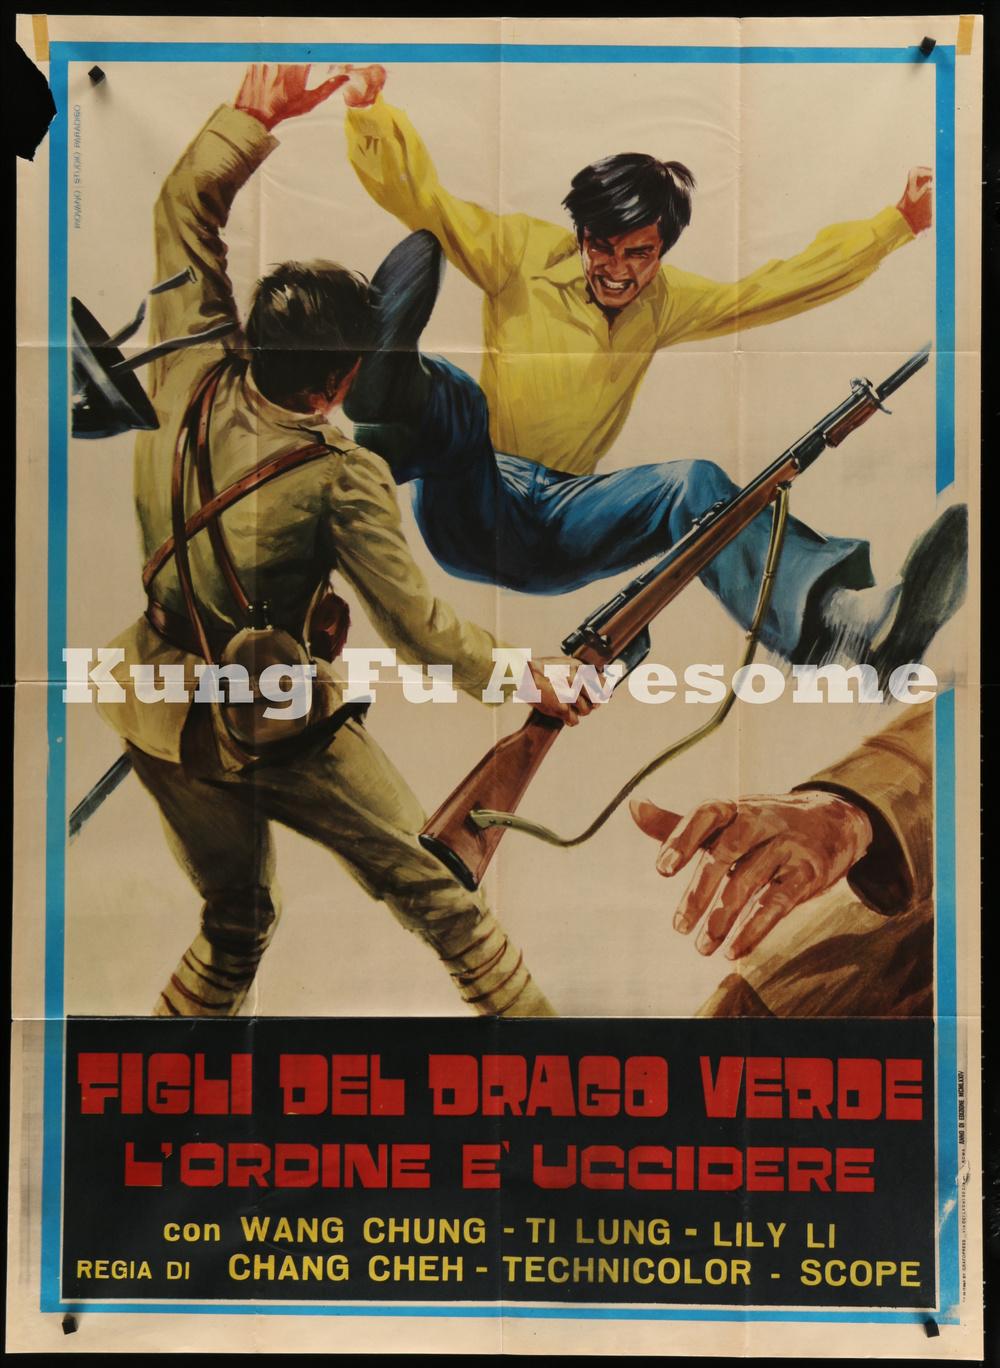 italian_1p_heroic_ones_JC10451_L.jpg